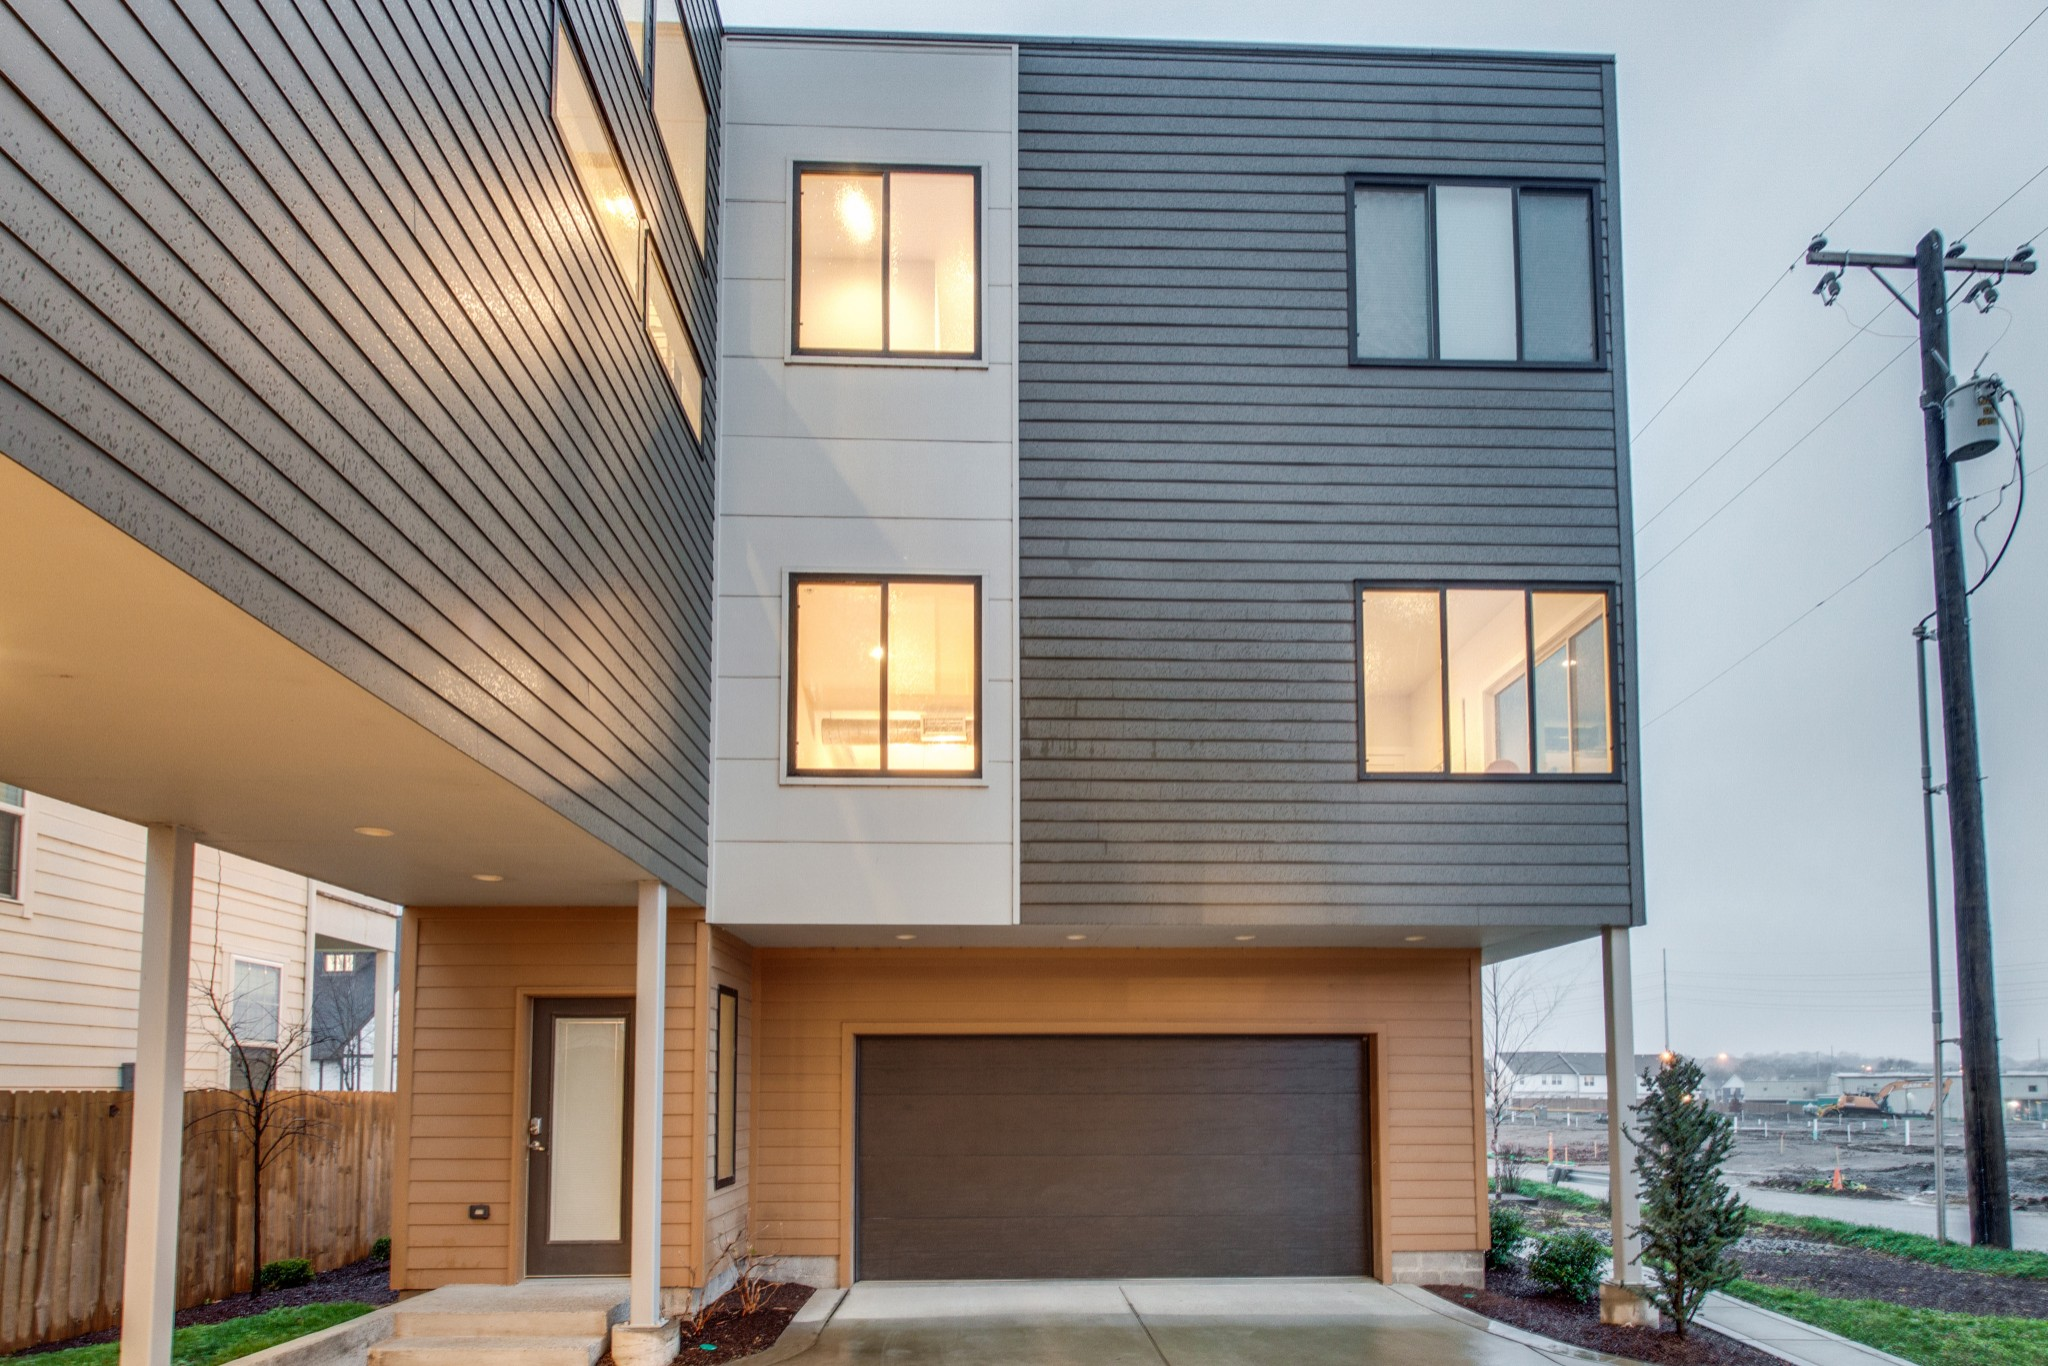 5614 New York Ave, Nashville, TN 37209 - Nashville, TN real estate listing